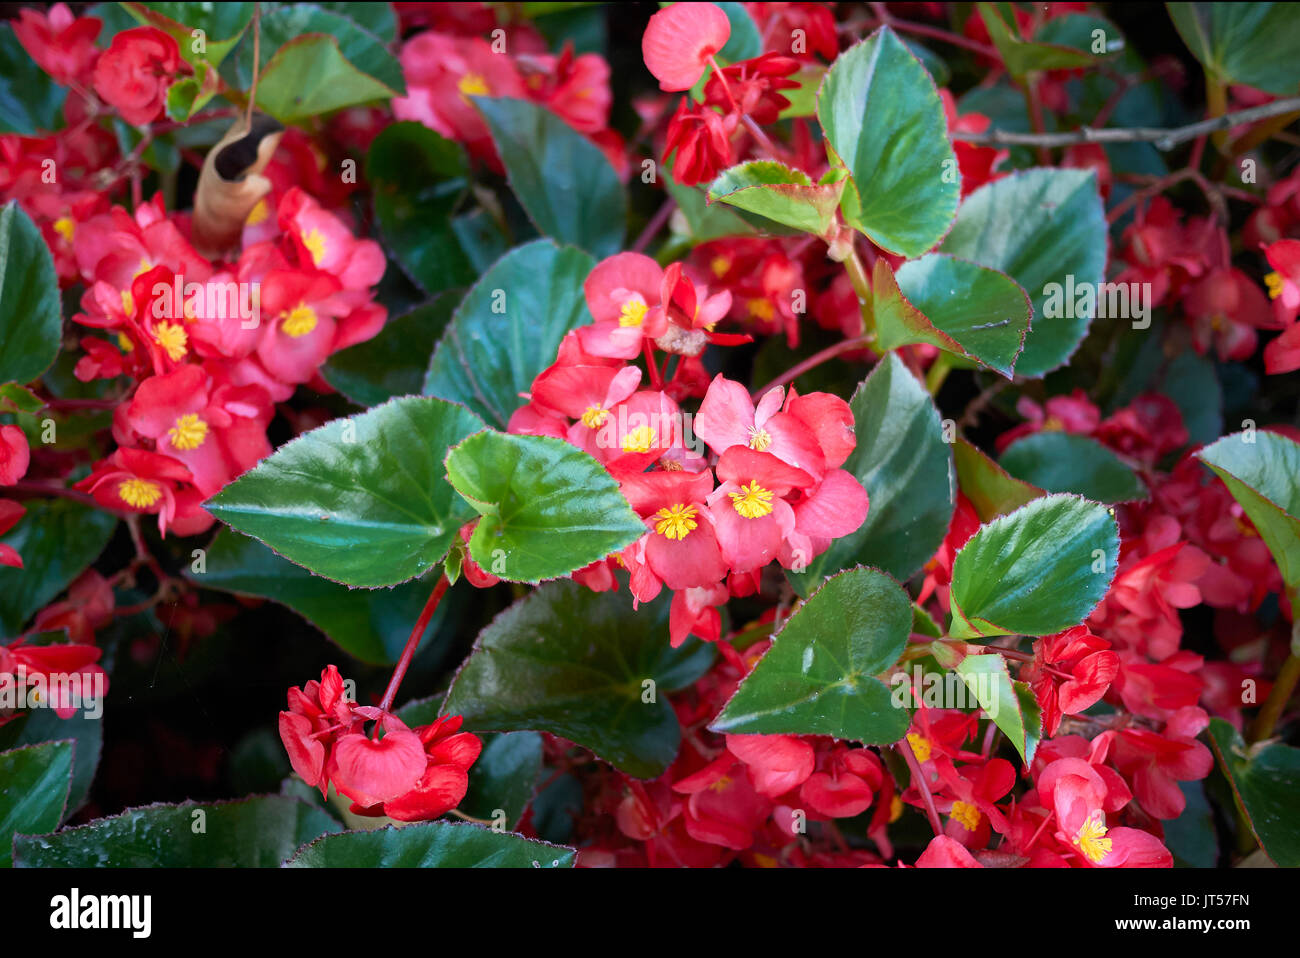 Begonia Bloom Stock Photo 152550377 Alamy